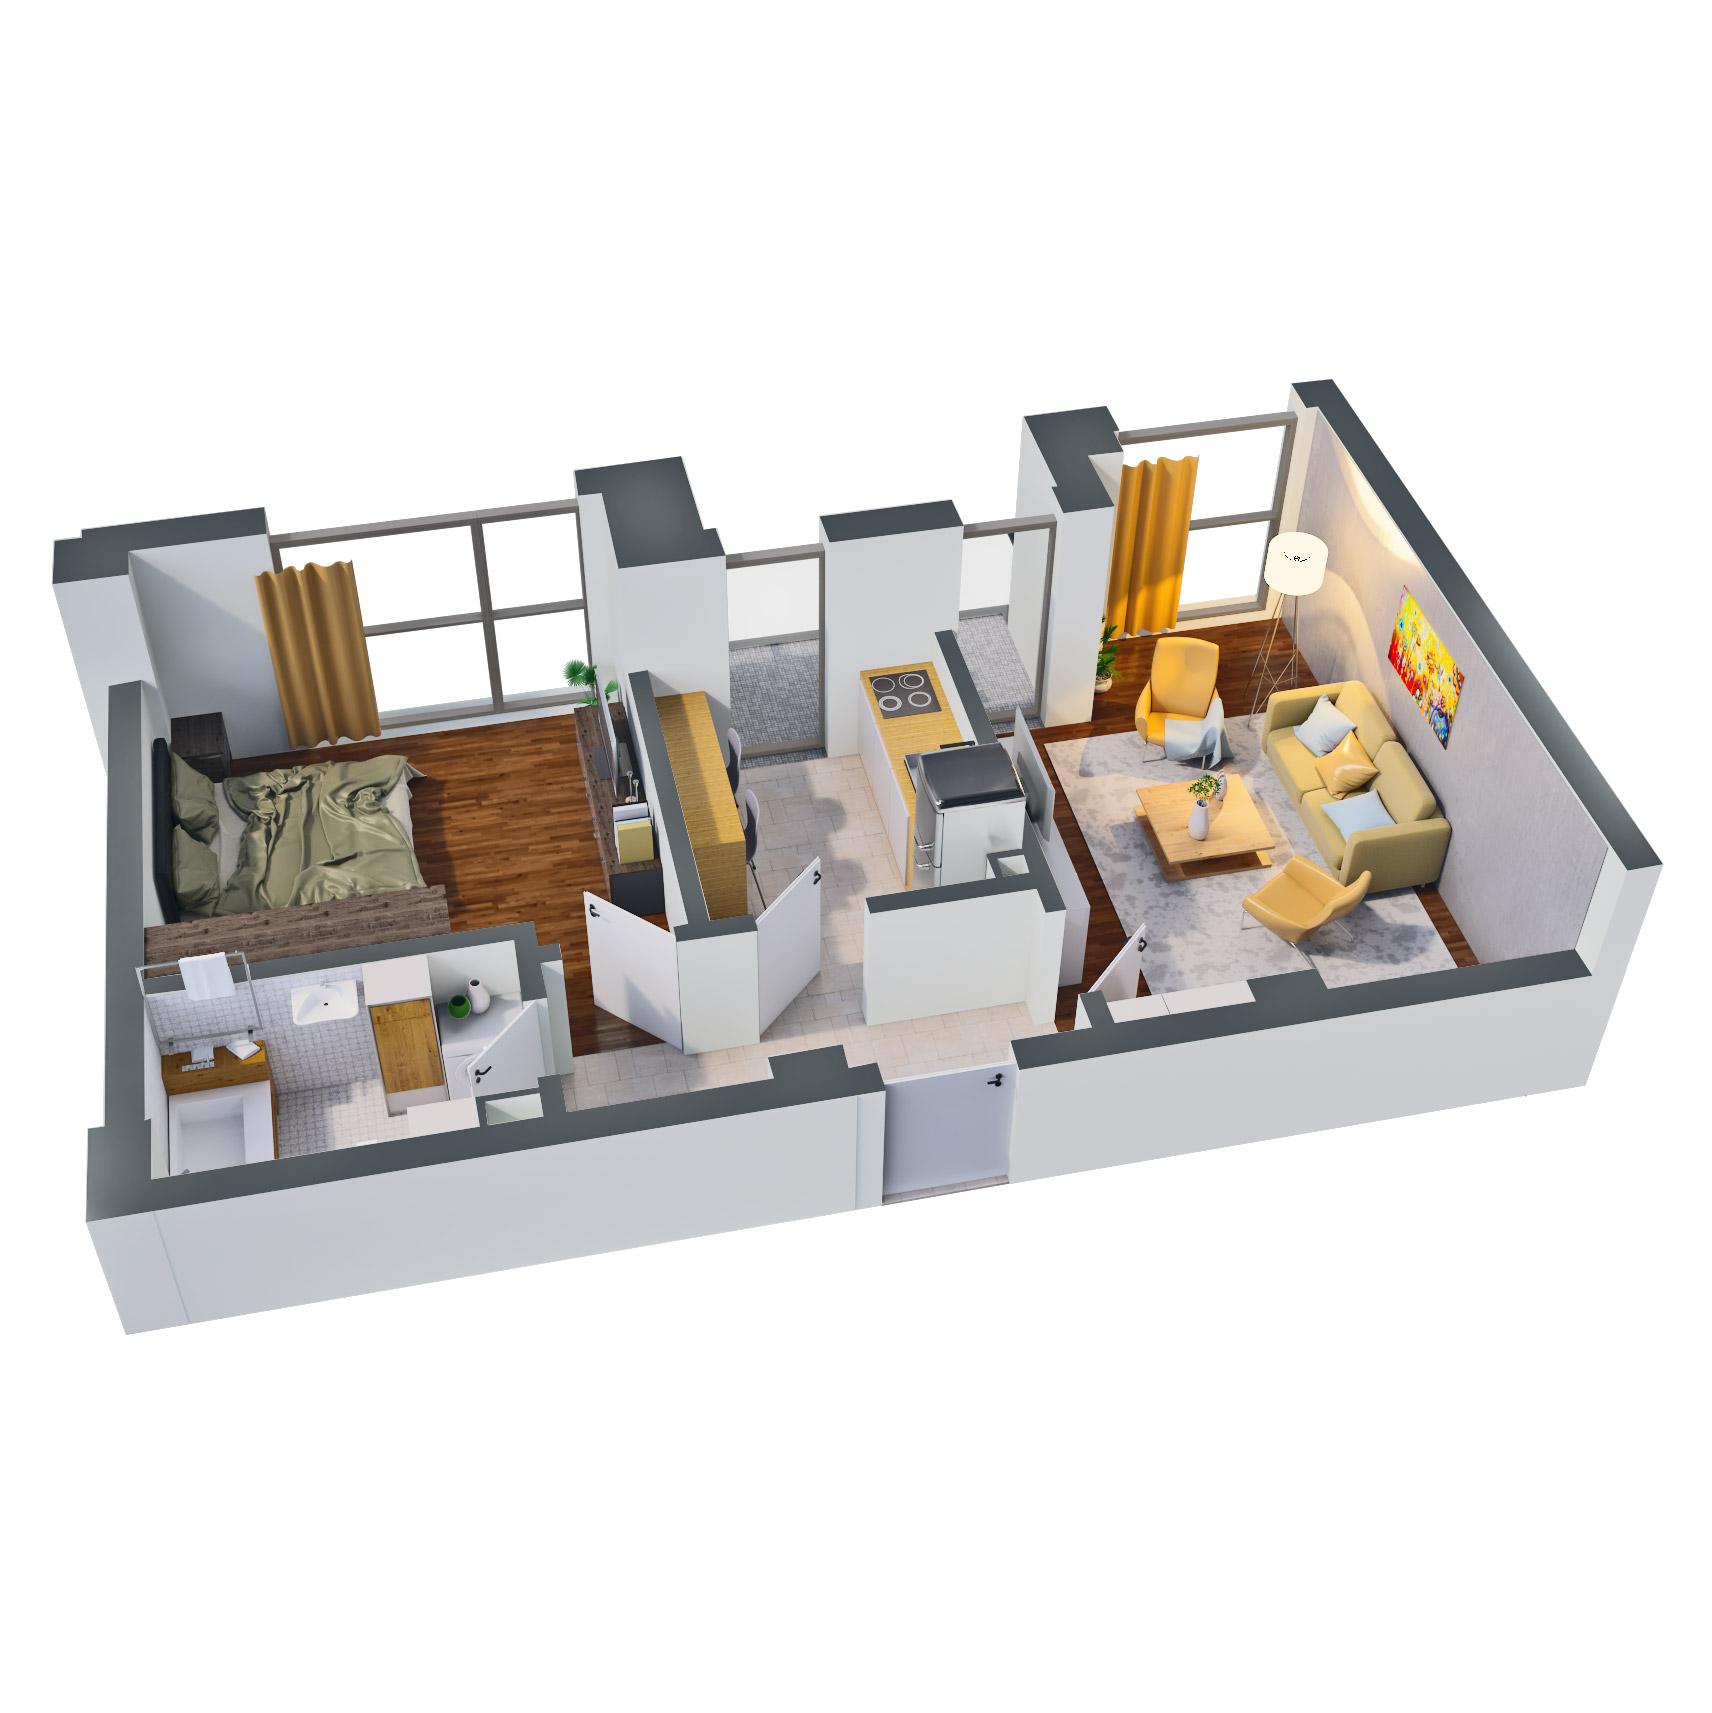 Apartament 2 camere de vanzare Bucuresti - Catedral Residence - Marriott, Piata Unirii, 13 Septembrie, Izvor - Tip 2 - T1 - D